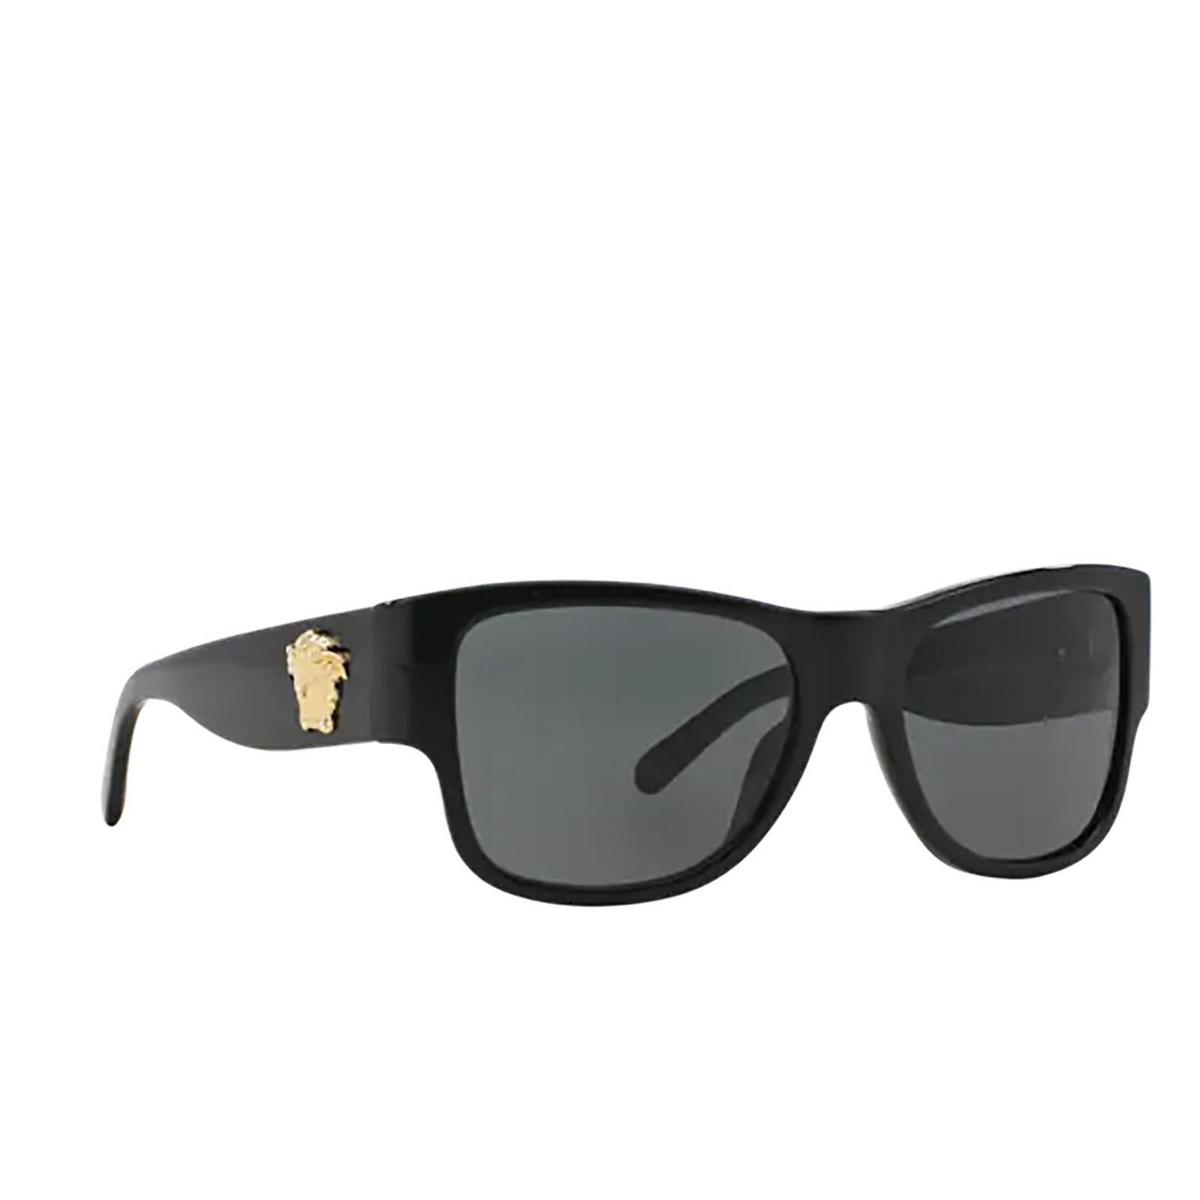 Versace® Square Sunglasses: VE4275 color Black GB1/87.